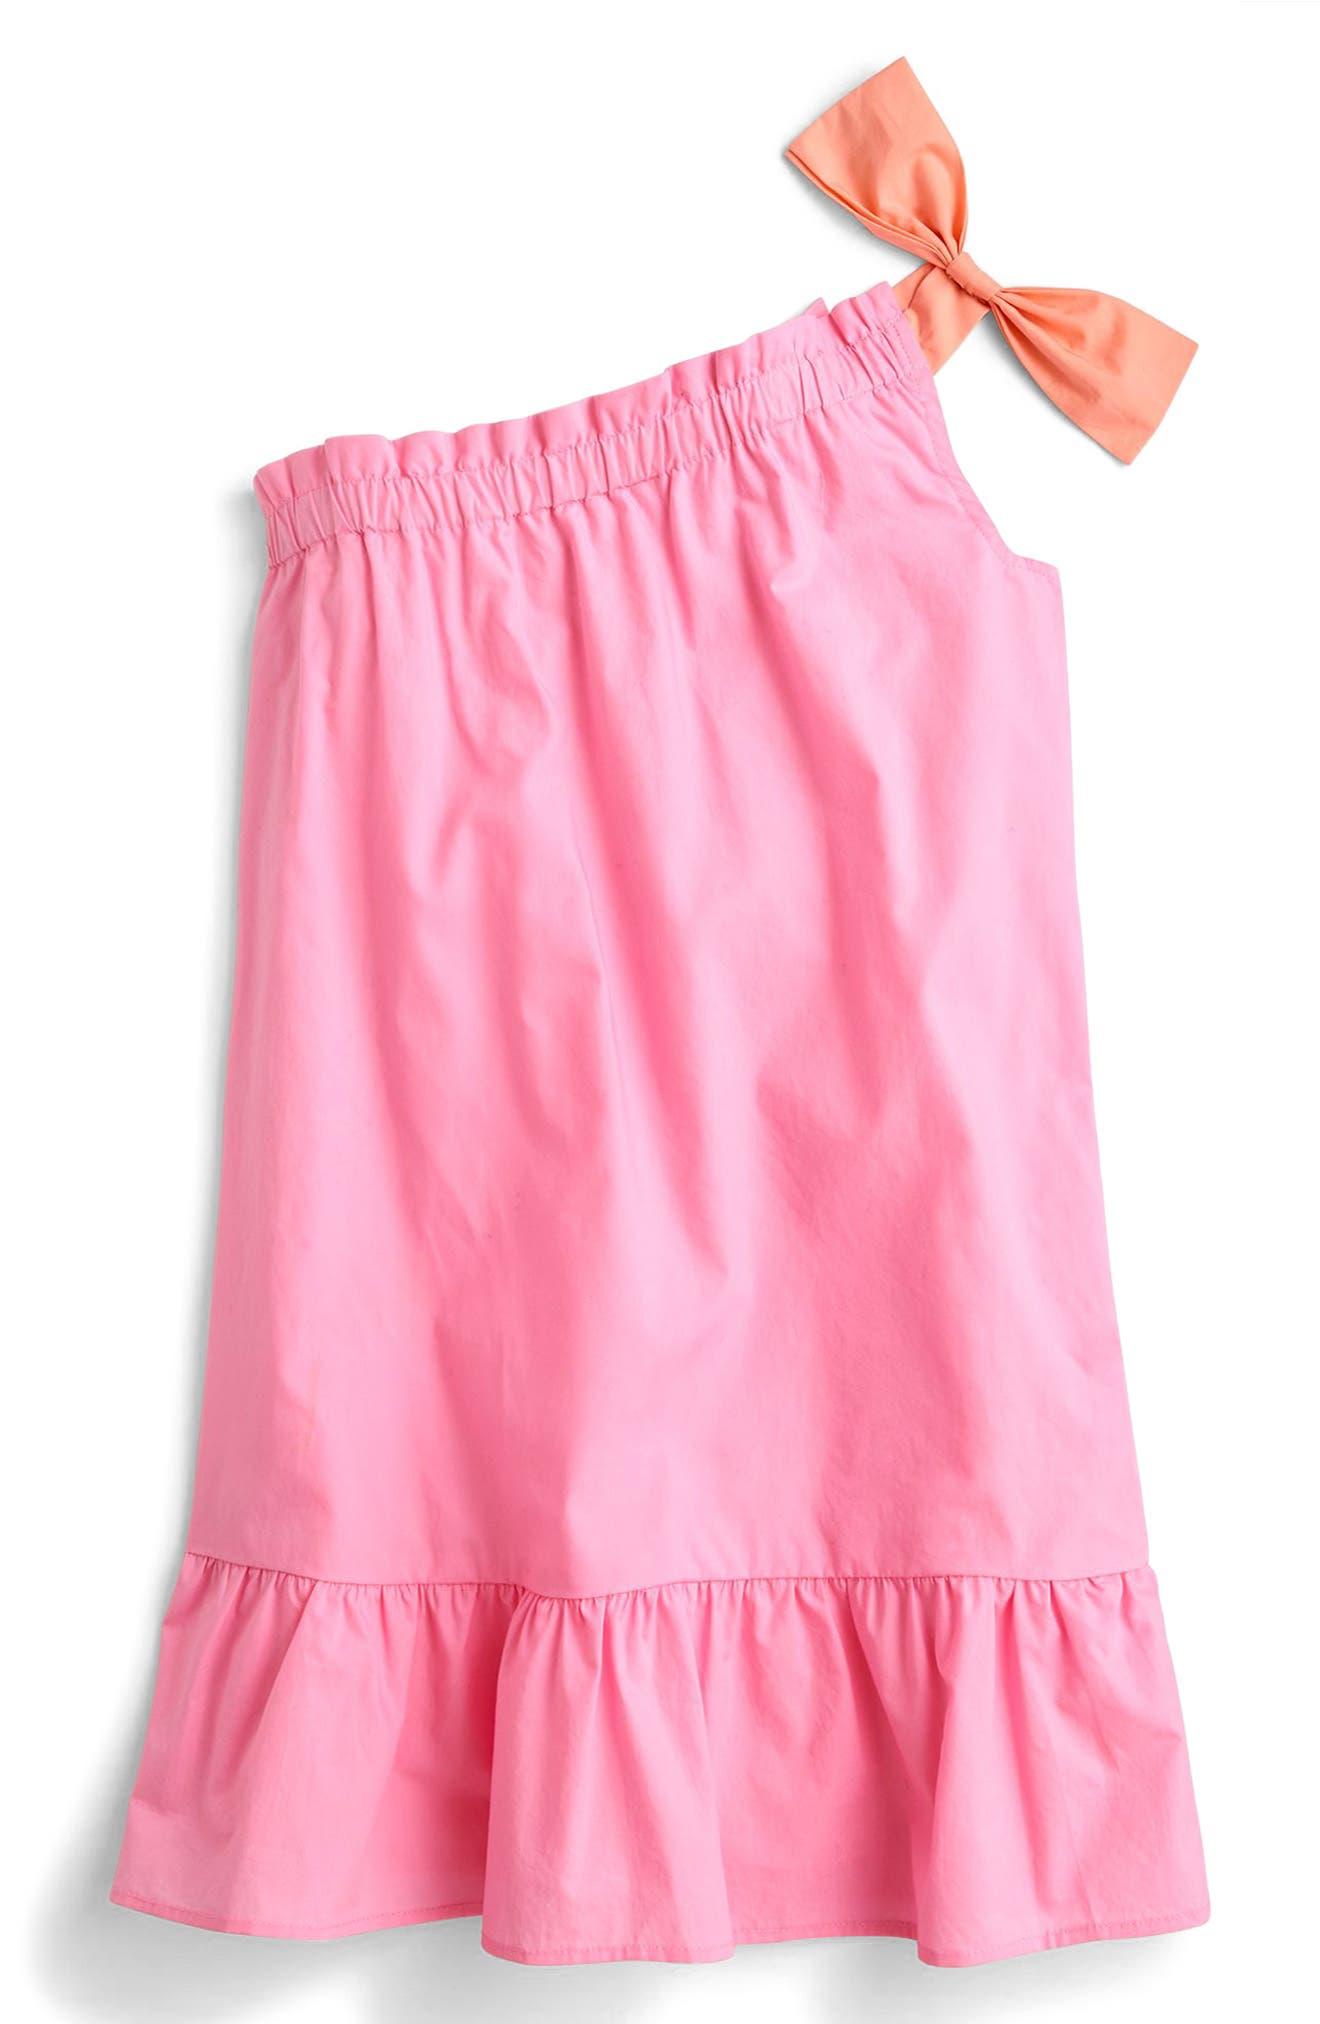 Calpurnia One-Shoulder Dress,                         Main,                         color, Neon Bubblegum Pk5446